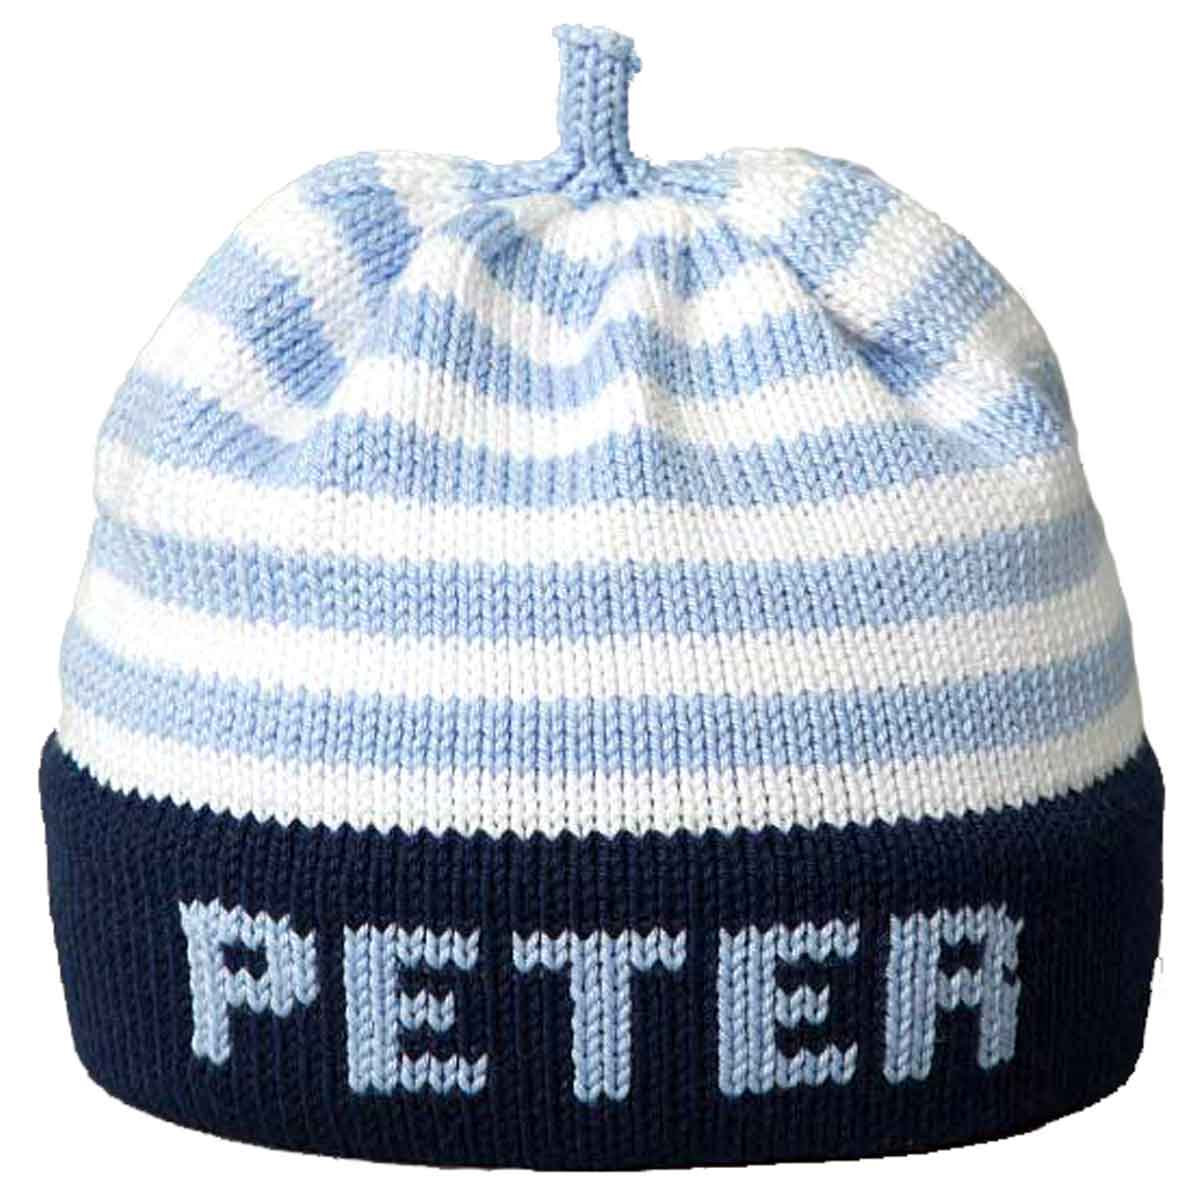 433e00c69e Personalized Knit Hat - Blue Stripe Navy Band - Margareta Horn Design